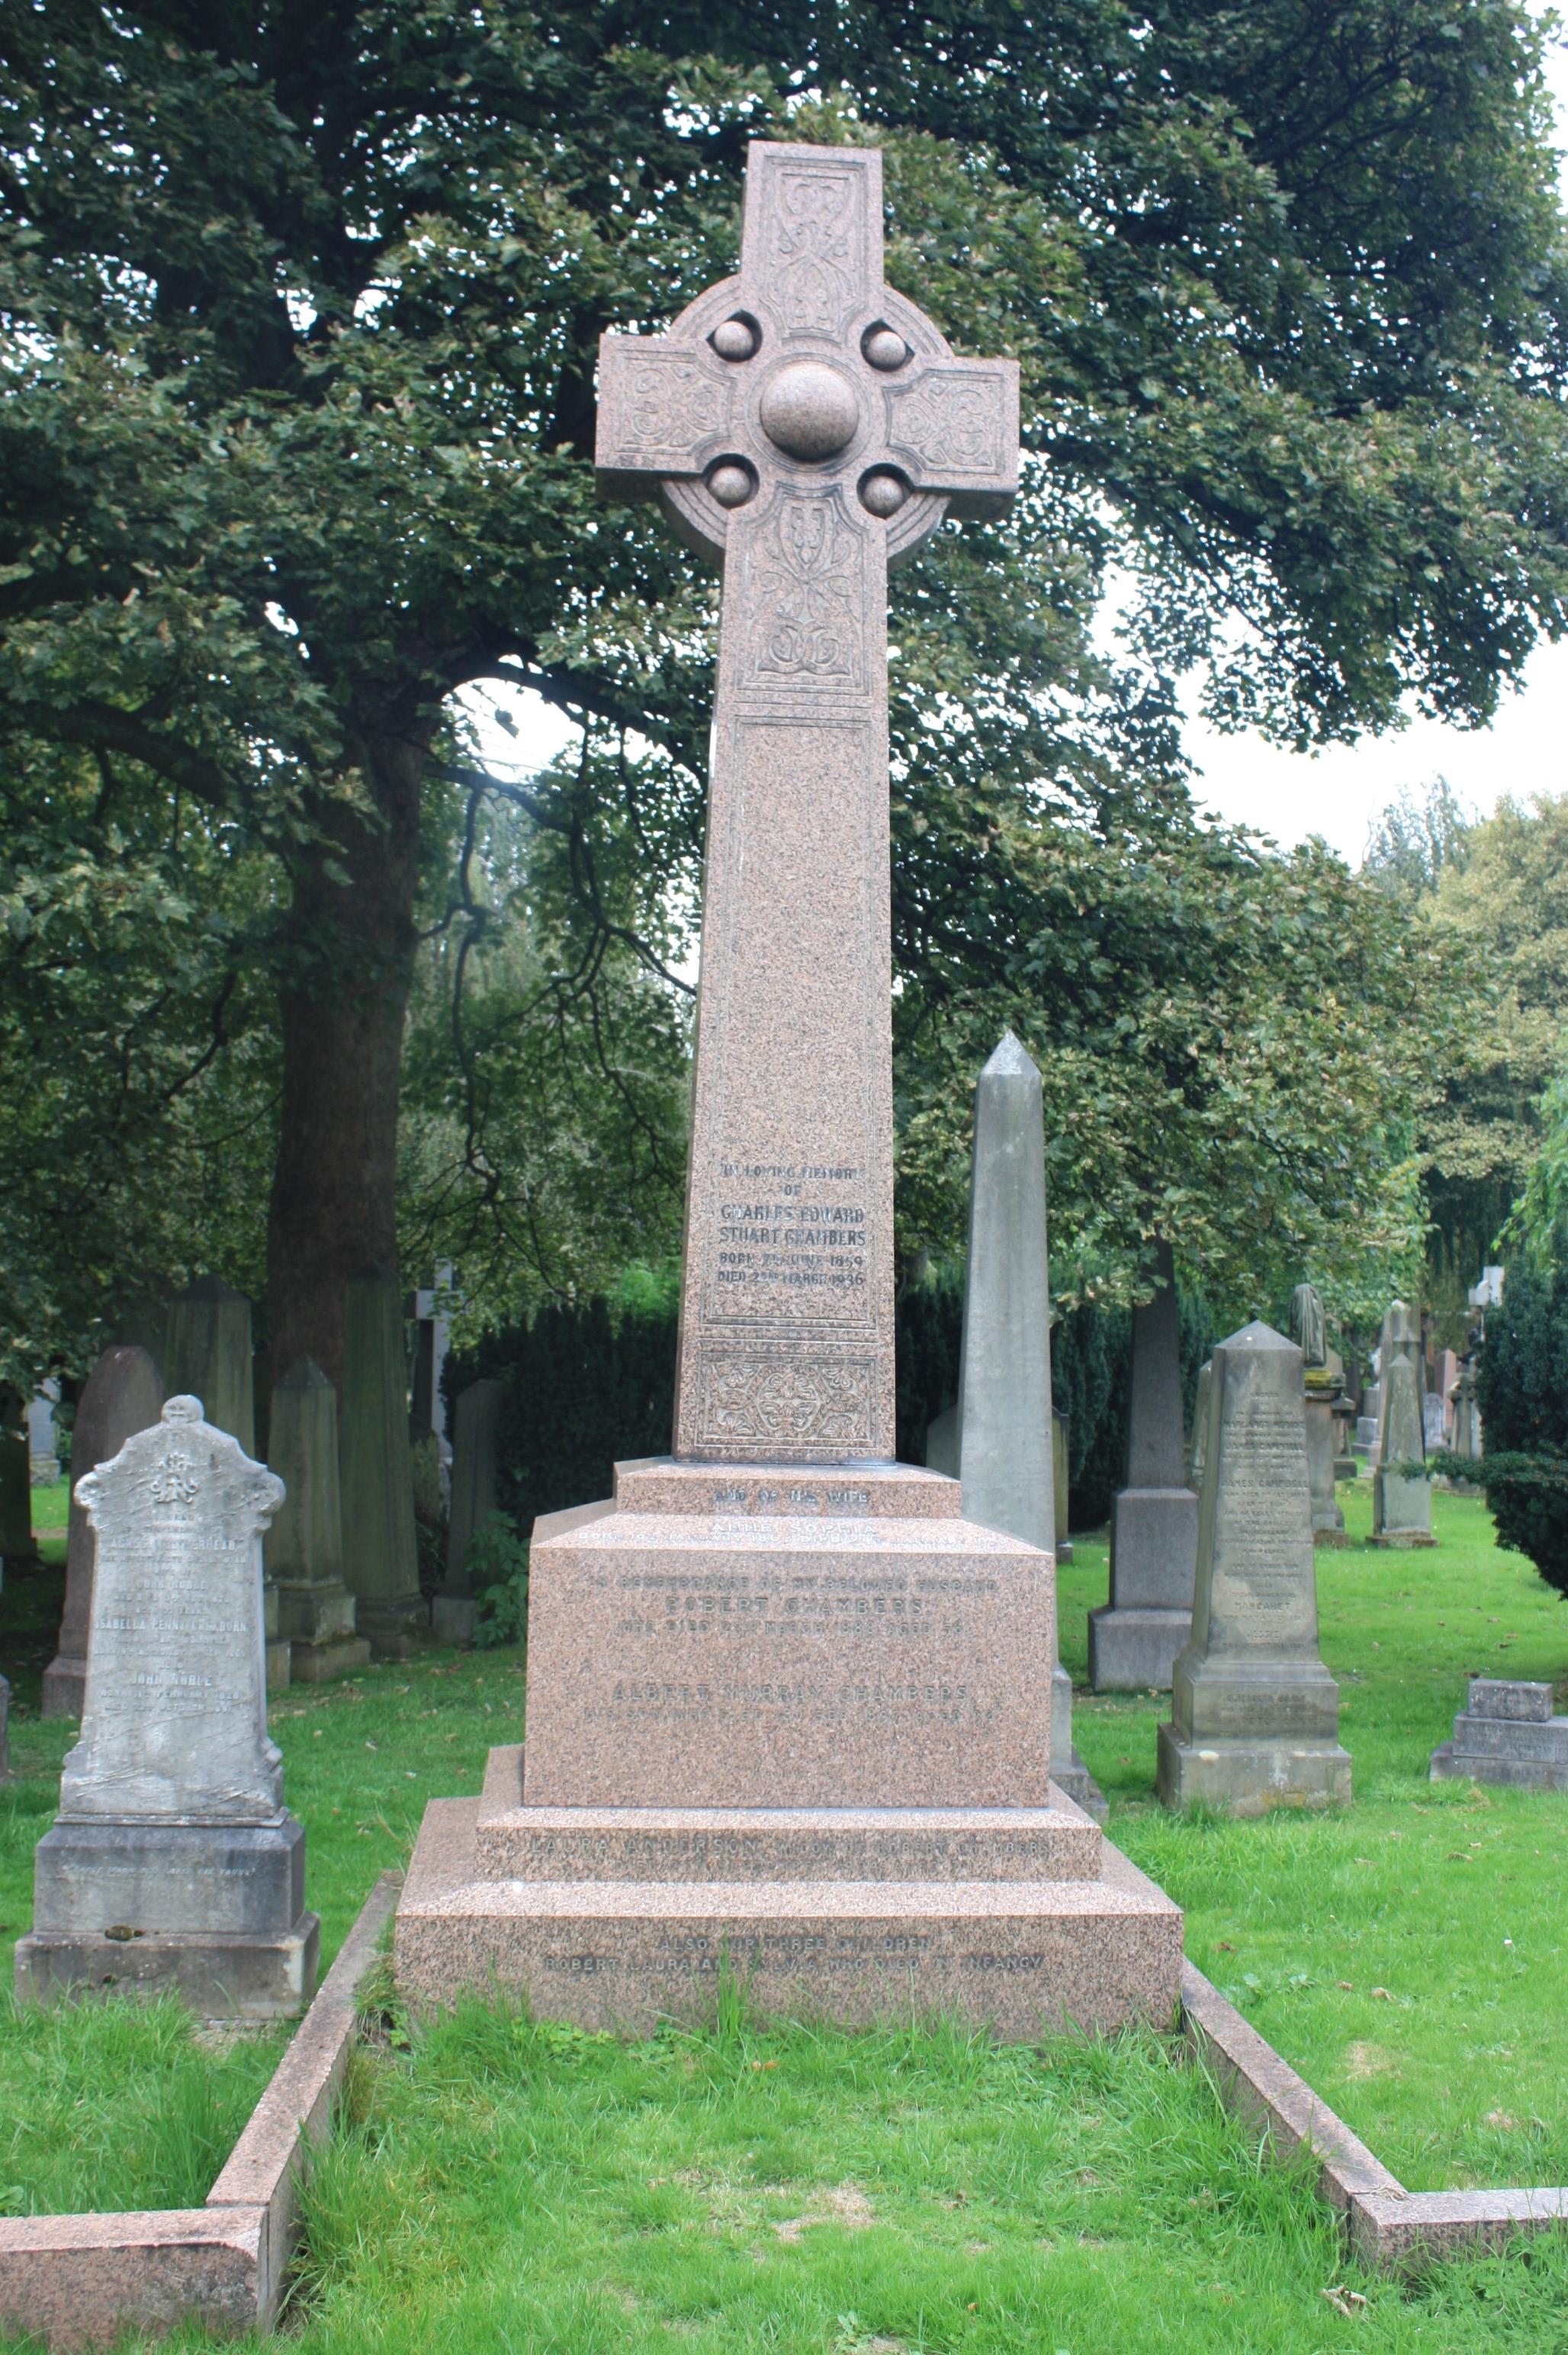 https://upload.wikimedia.org/wikipedia/commons/5/51/Robert_Chambers%27_grave%2C_Dean_Cemetery.JPG